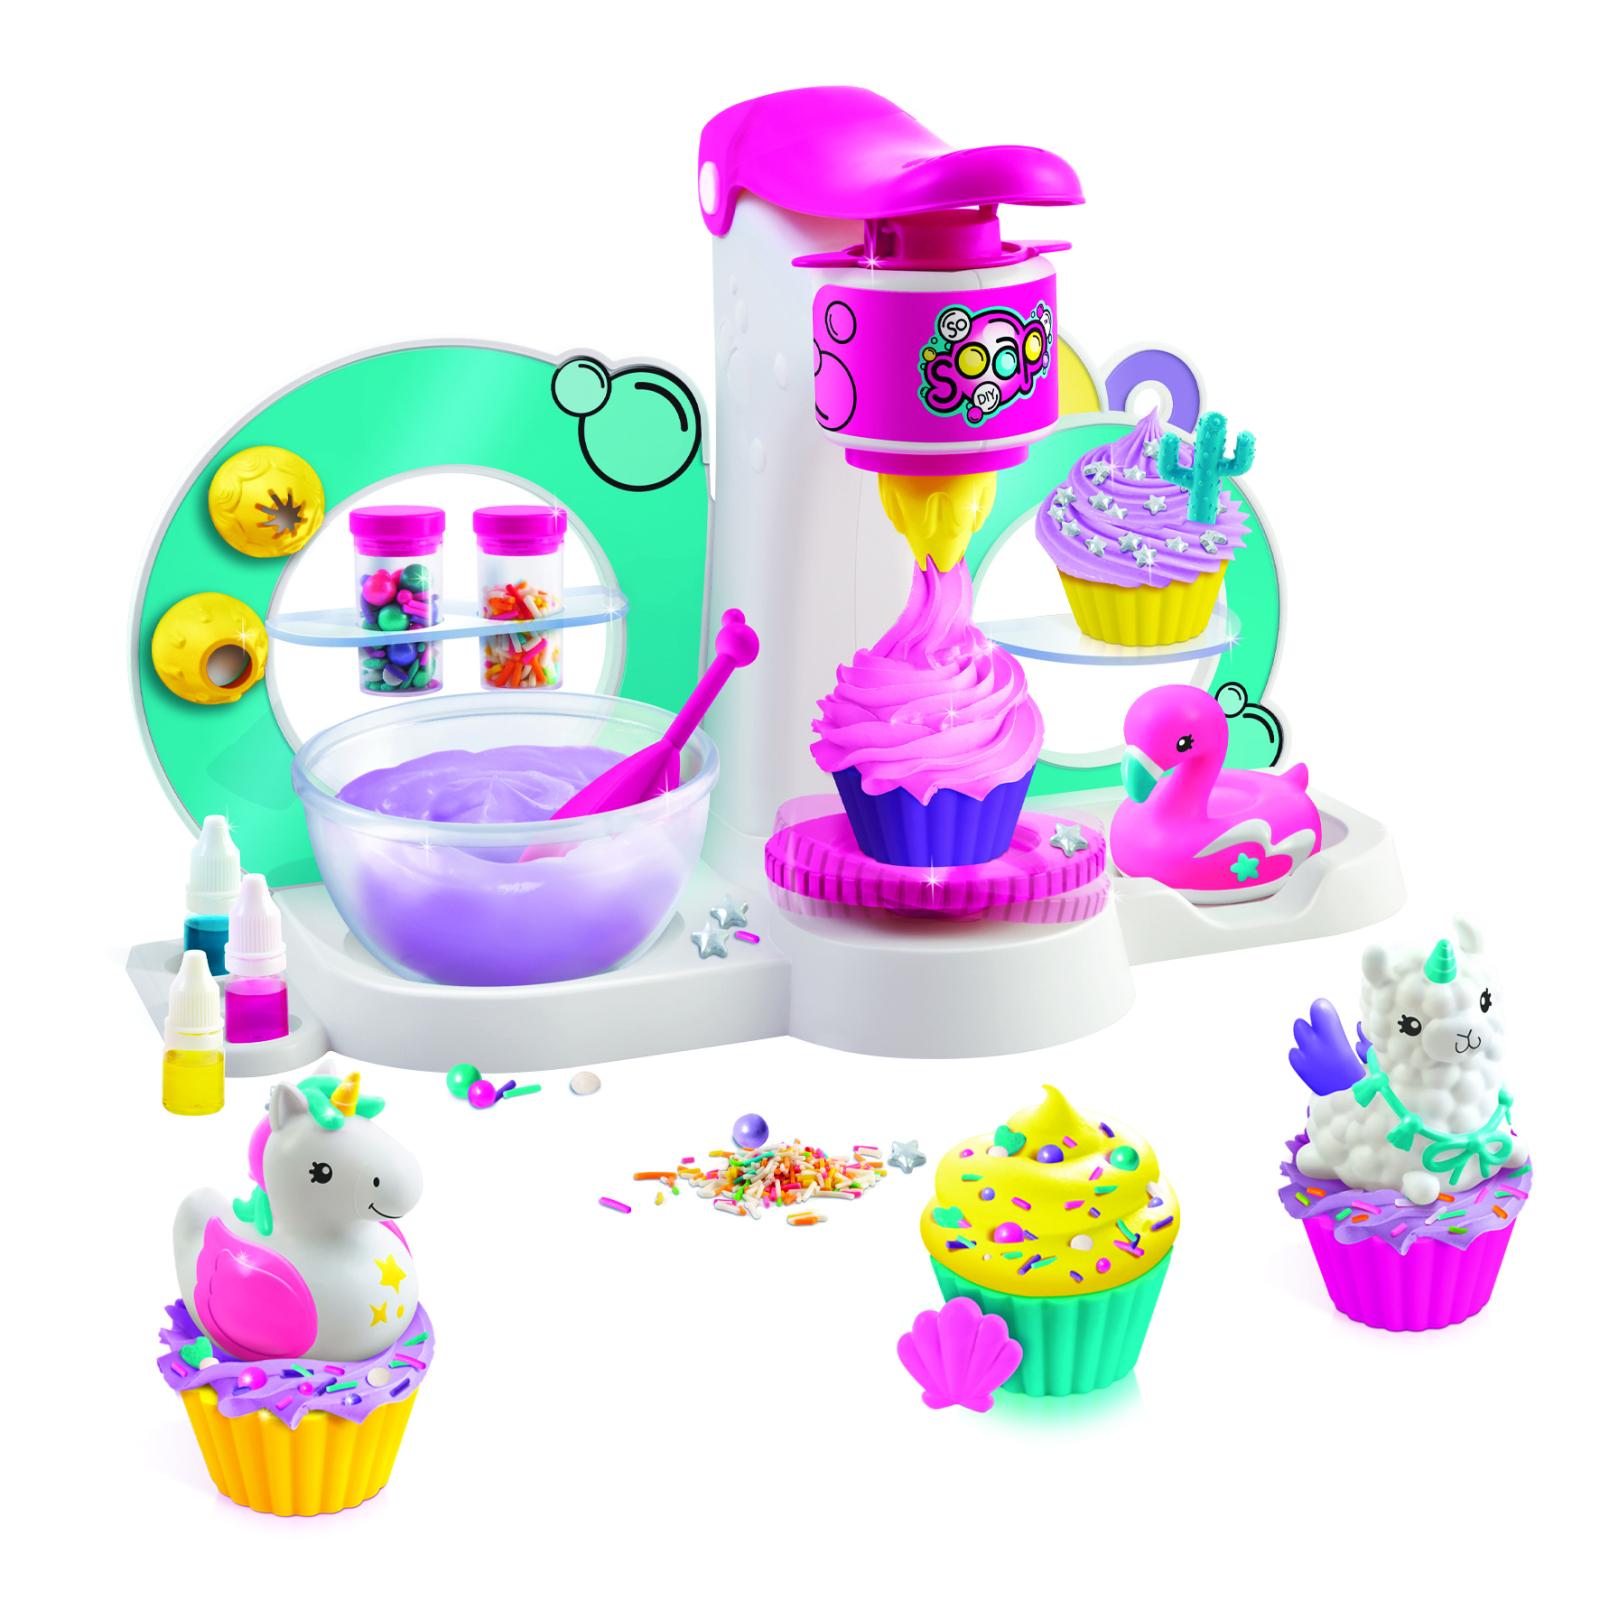 Набор для творчества Canal Toys So Soap Фабрика мыла (SOC003) изображение 3